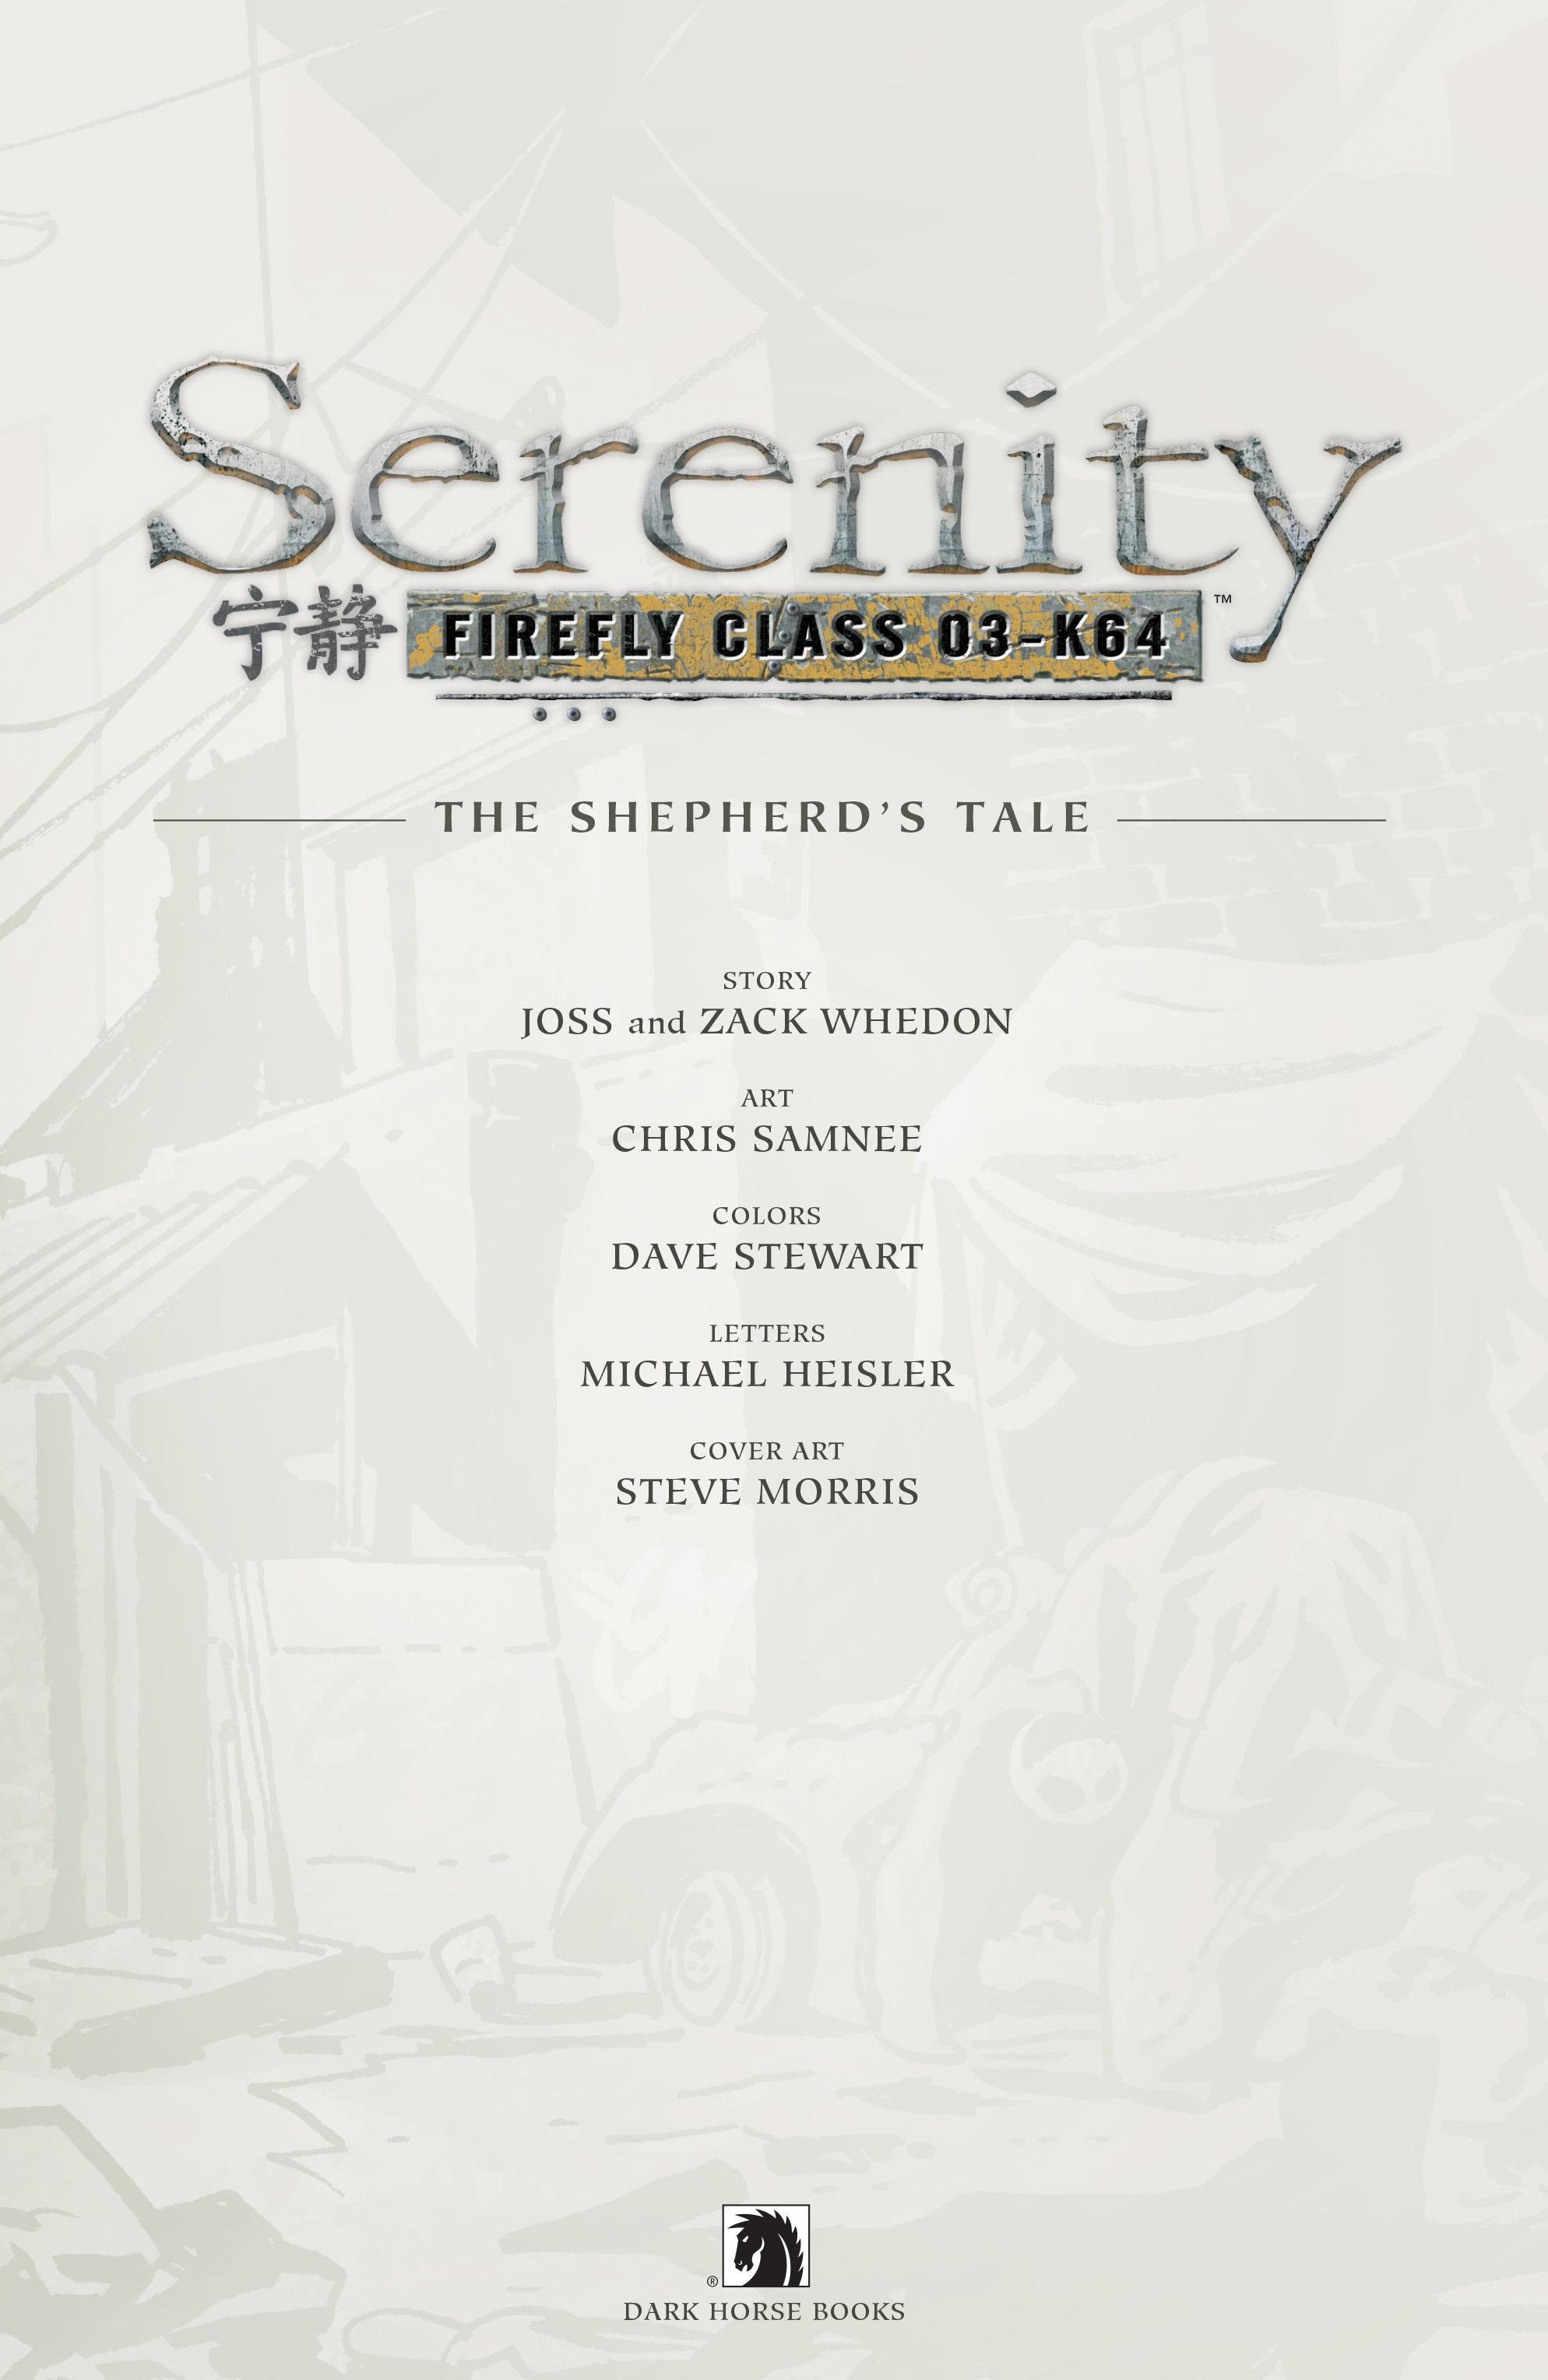 Read online Serenity Volume Three: The Shepherd's Tale comic -  Issue # TPB - 5